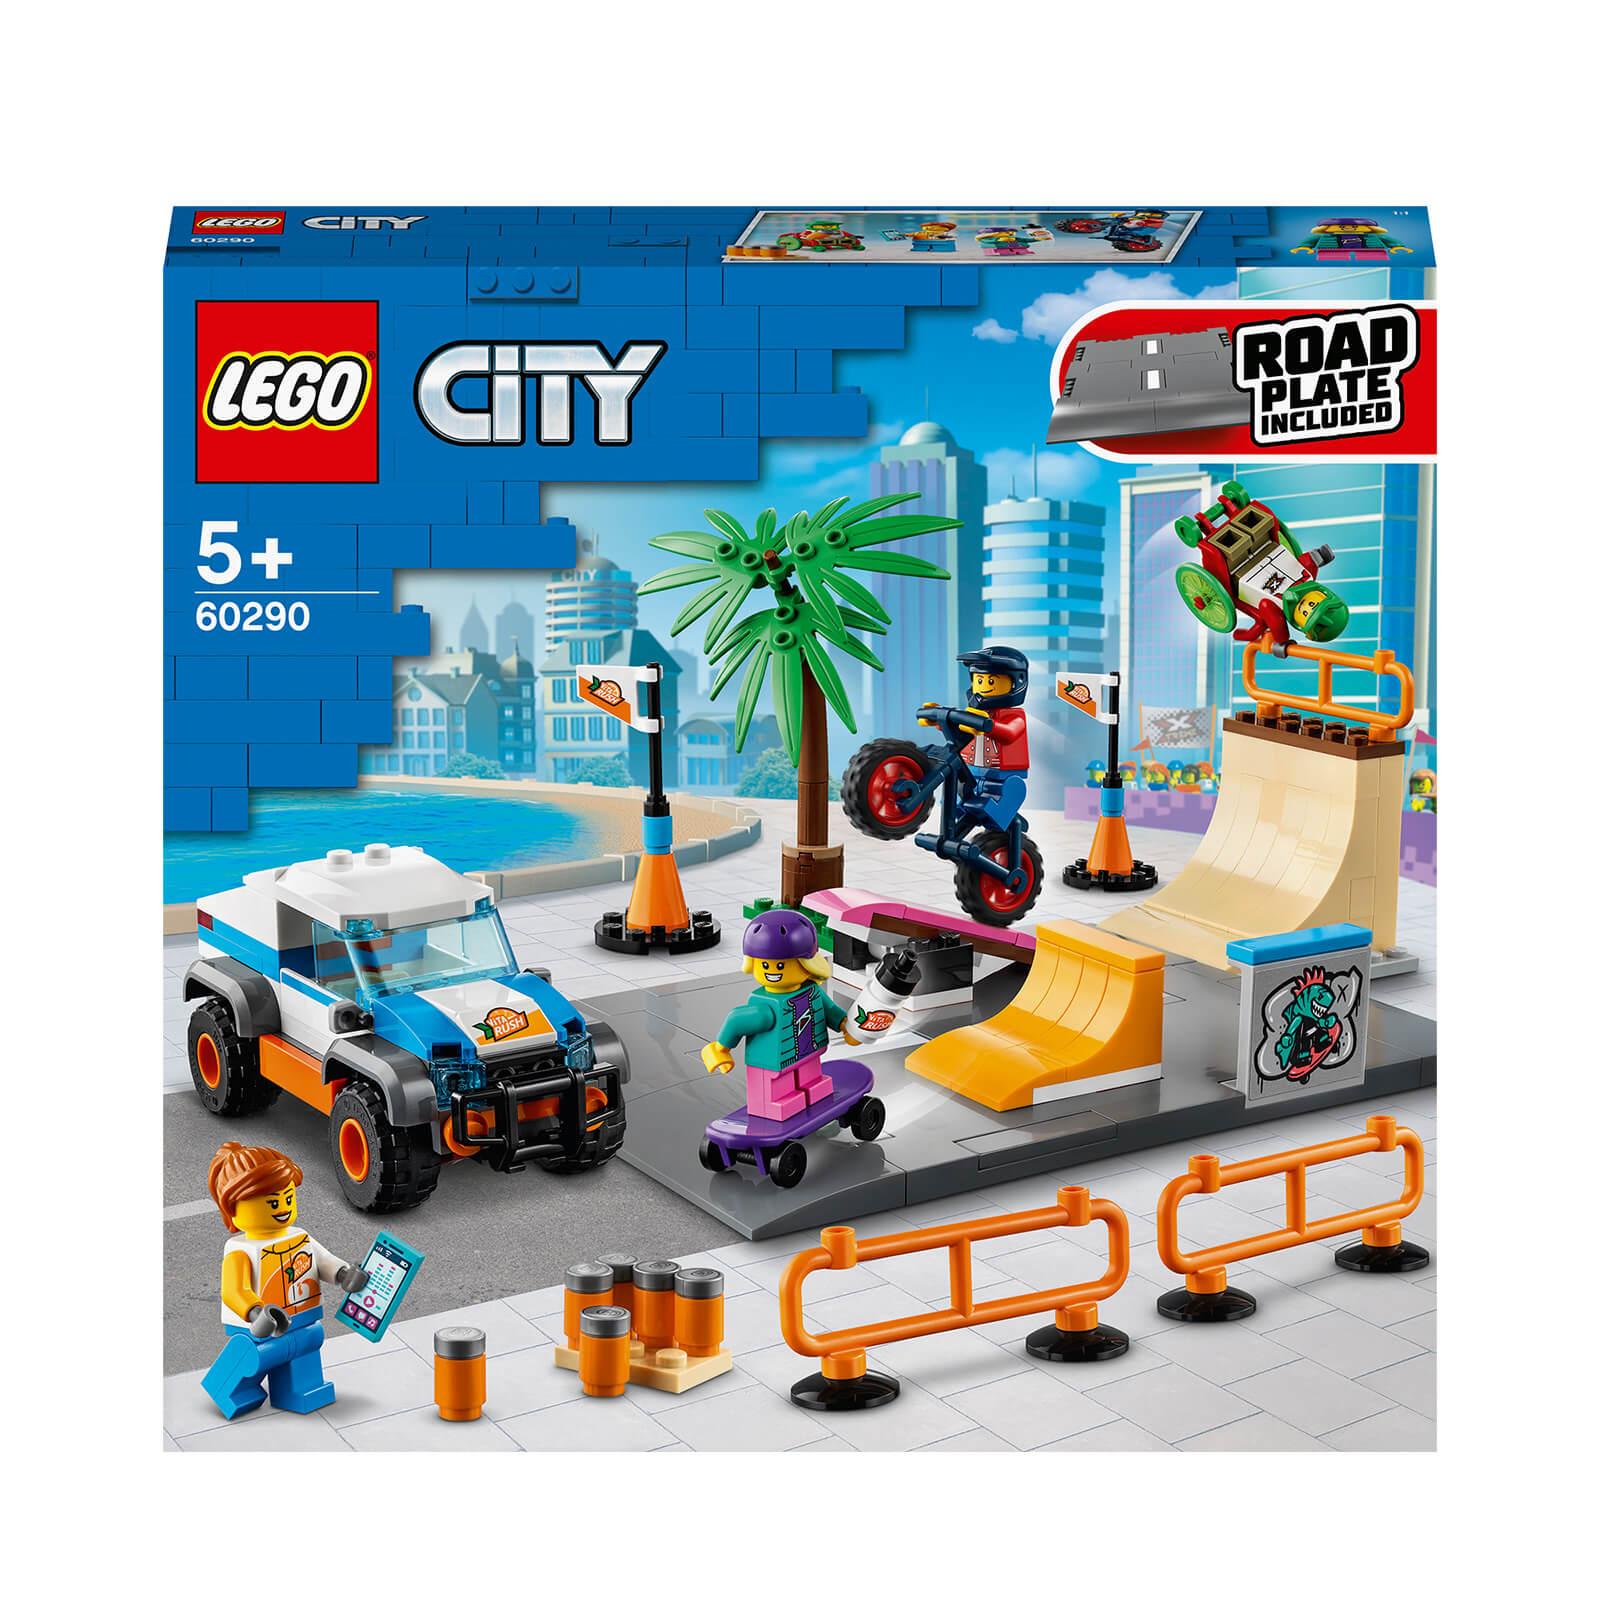 Image of LEGO City Community Skate Park - 60290